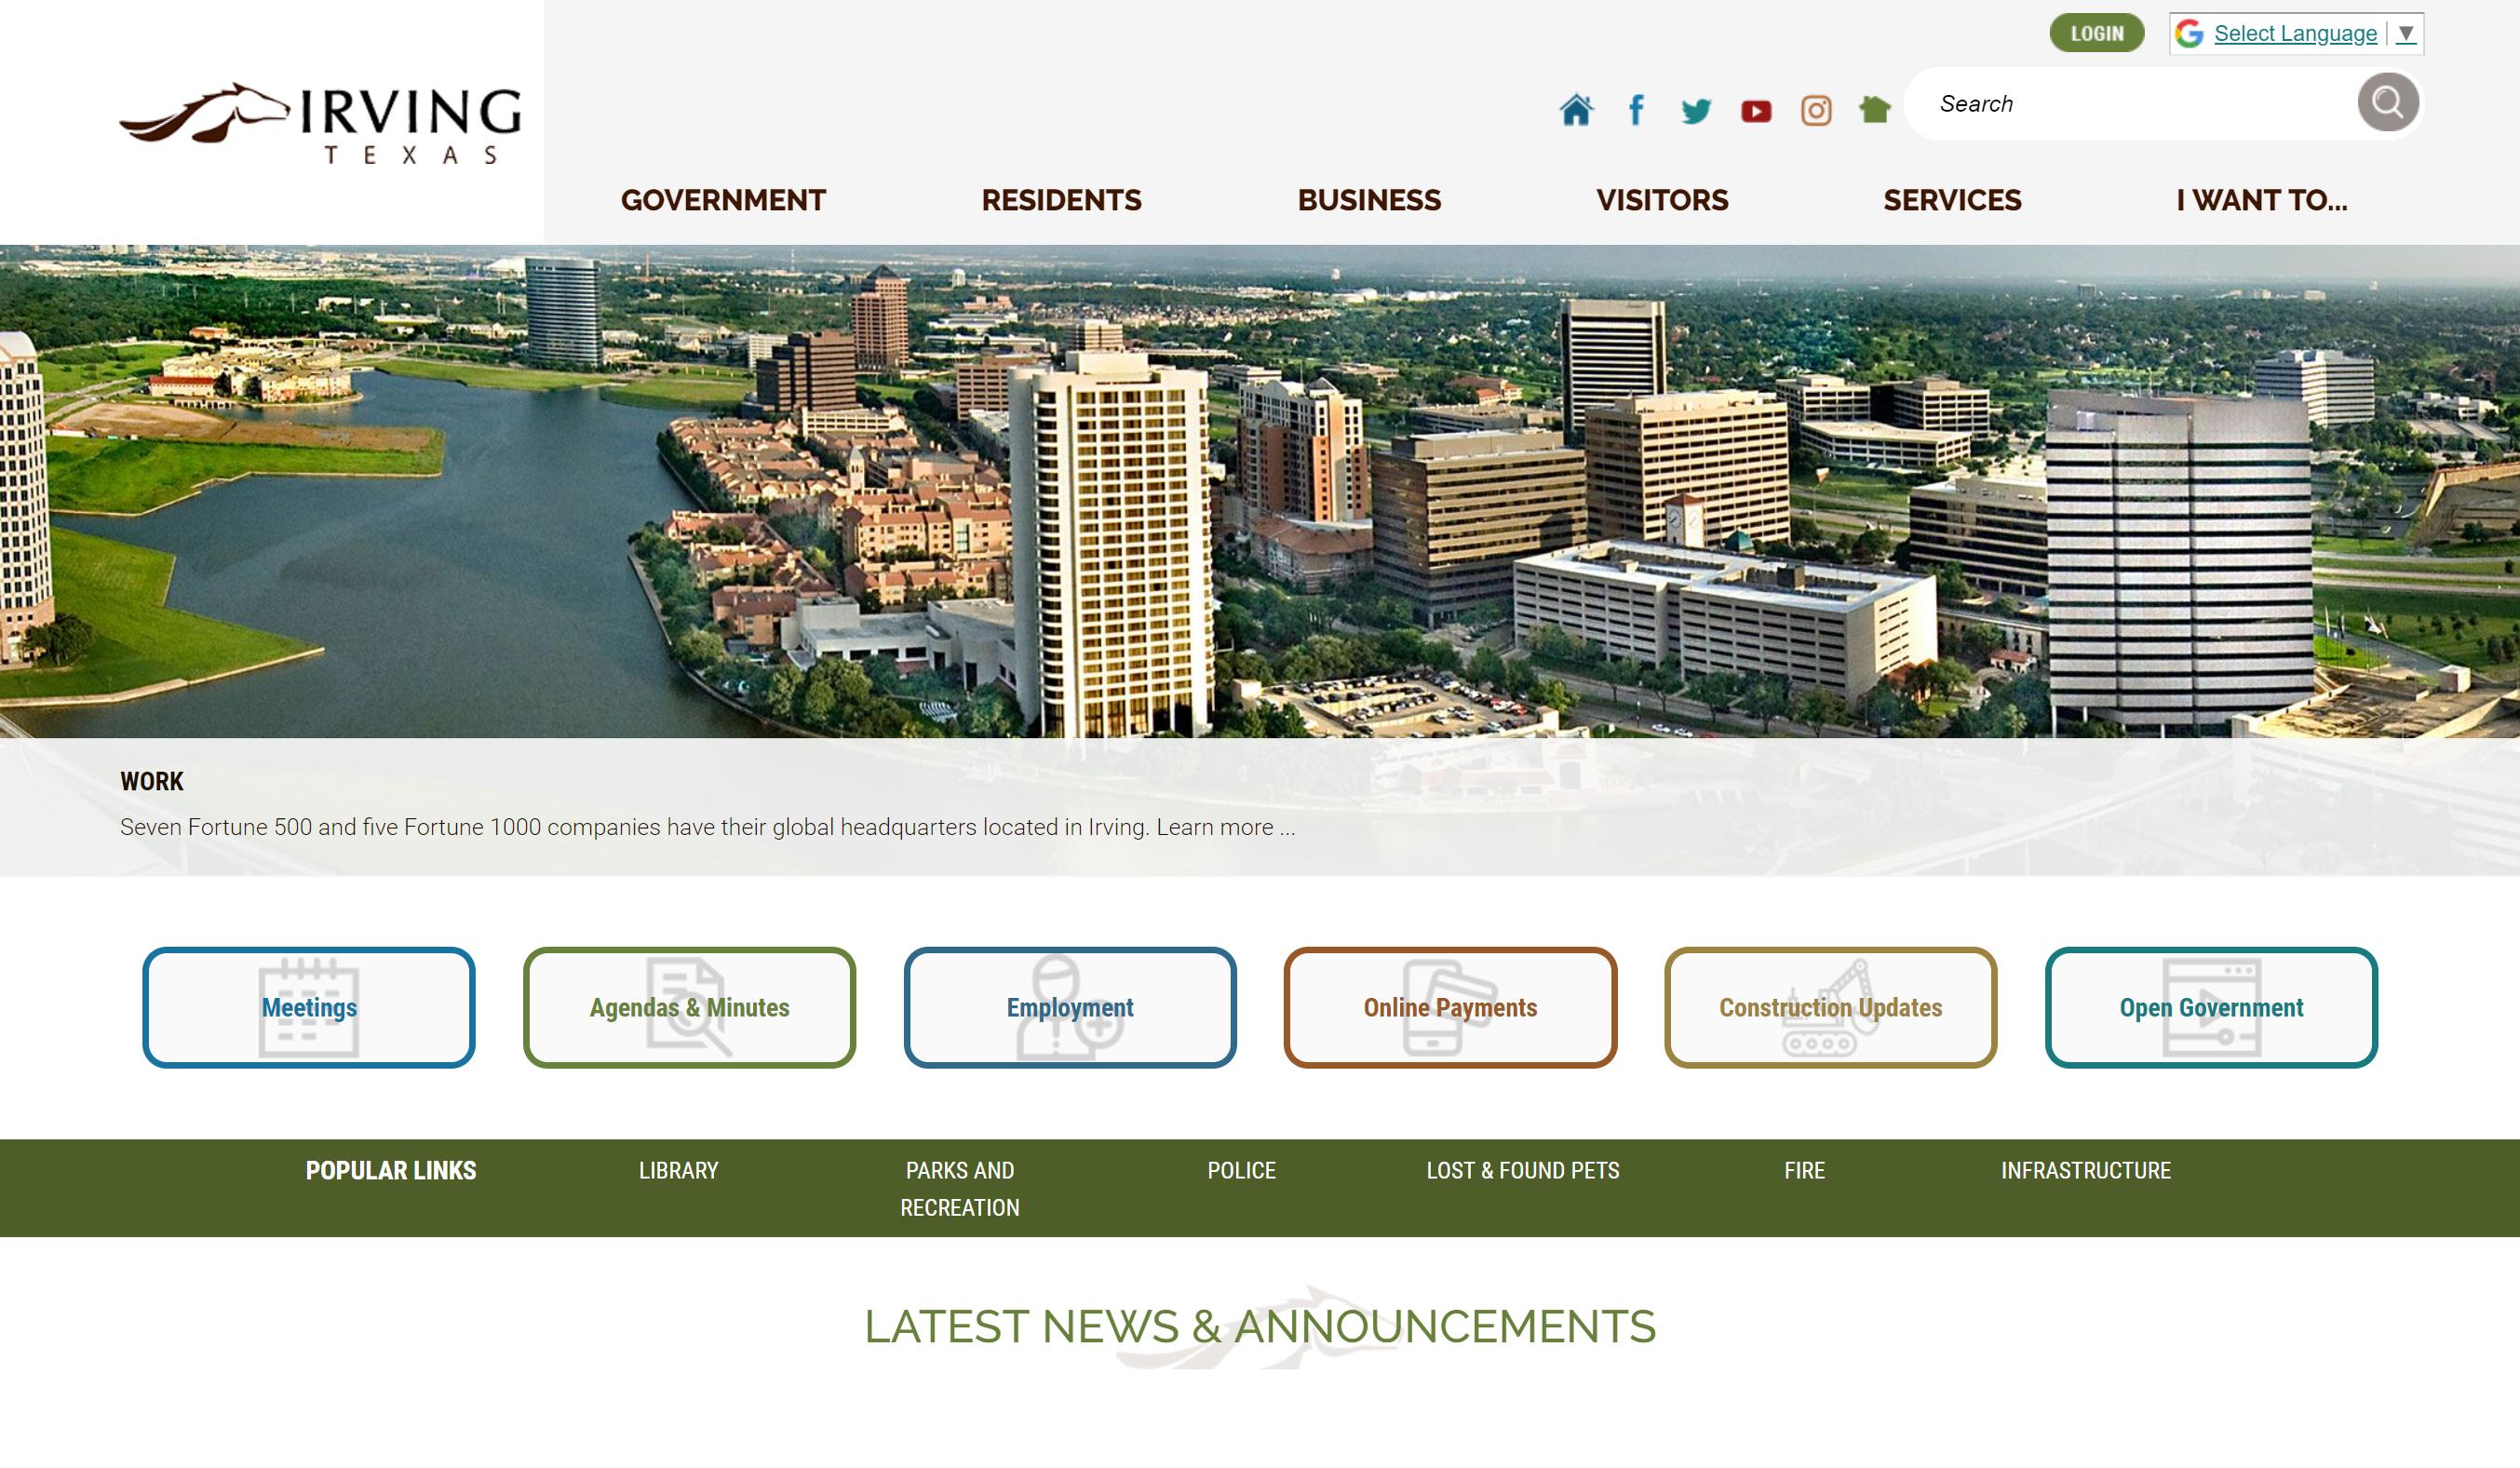 Irving_TX_City_Website_Award_CivicPlus